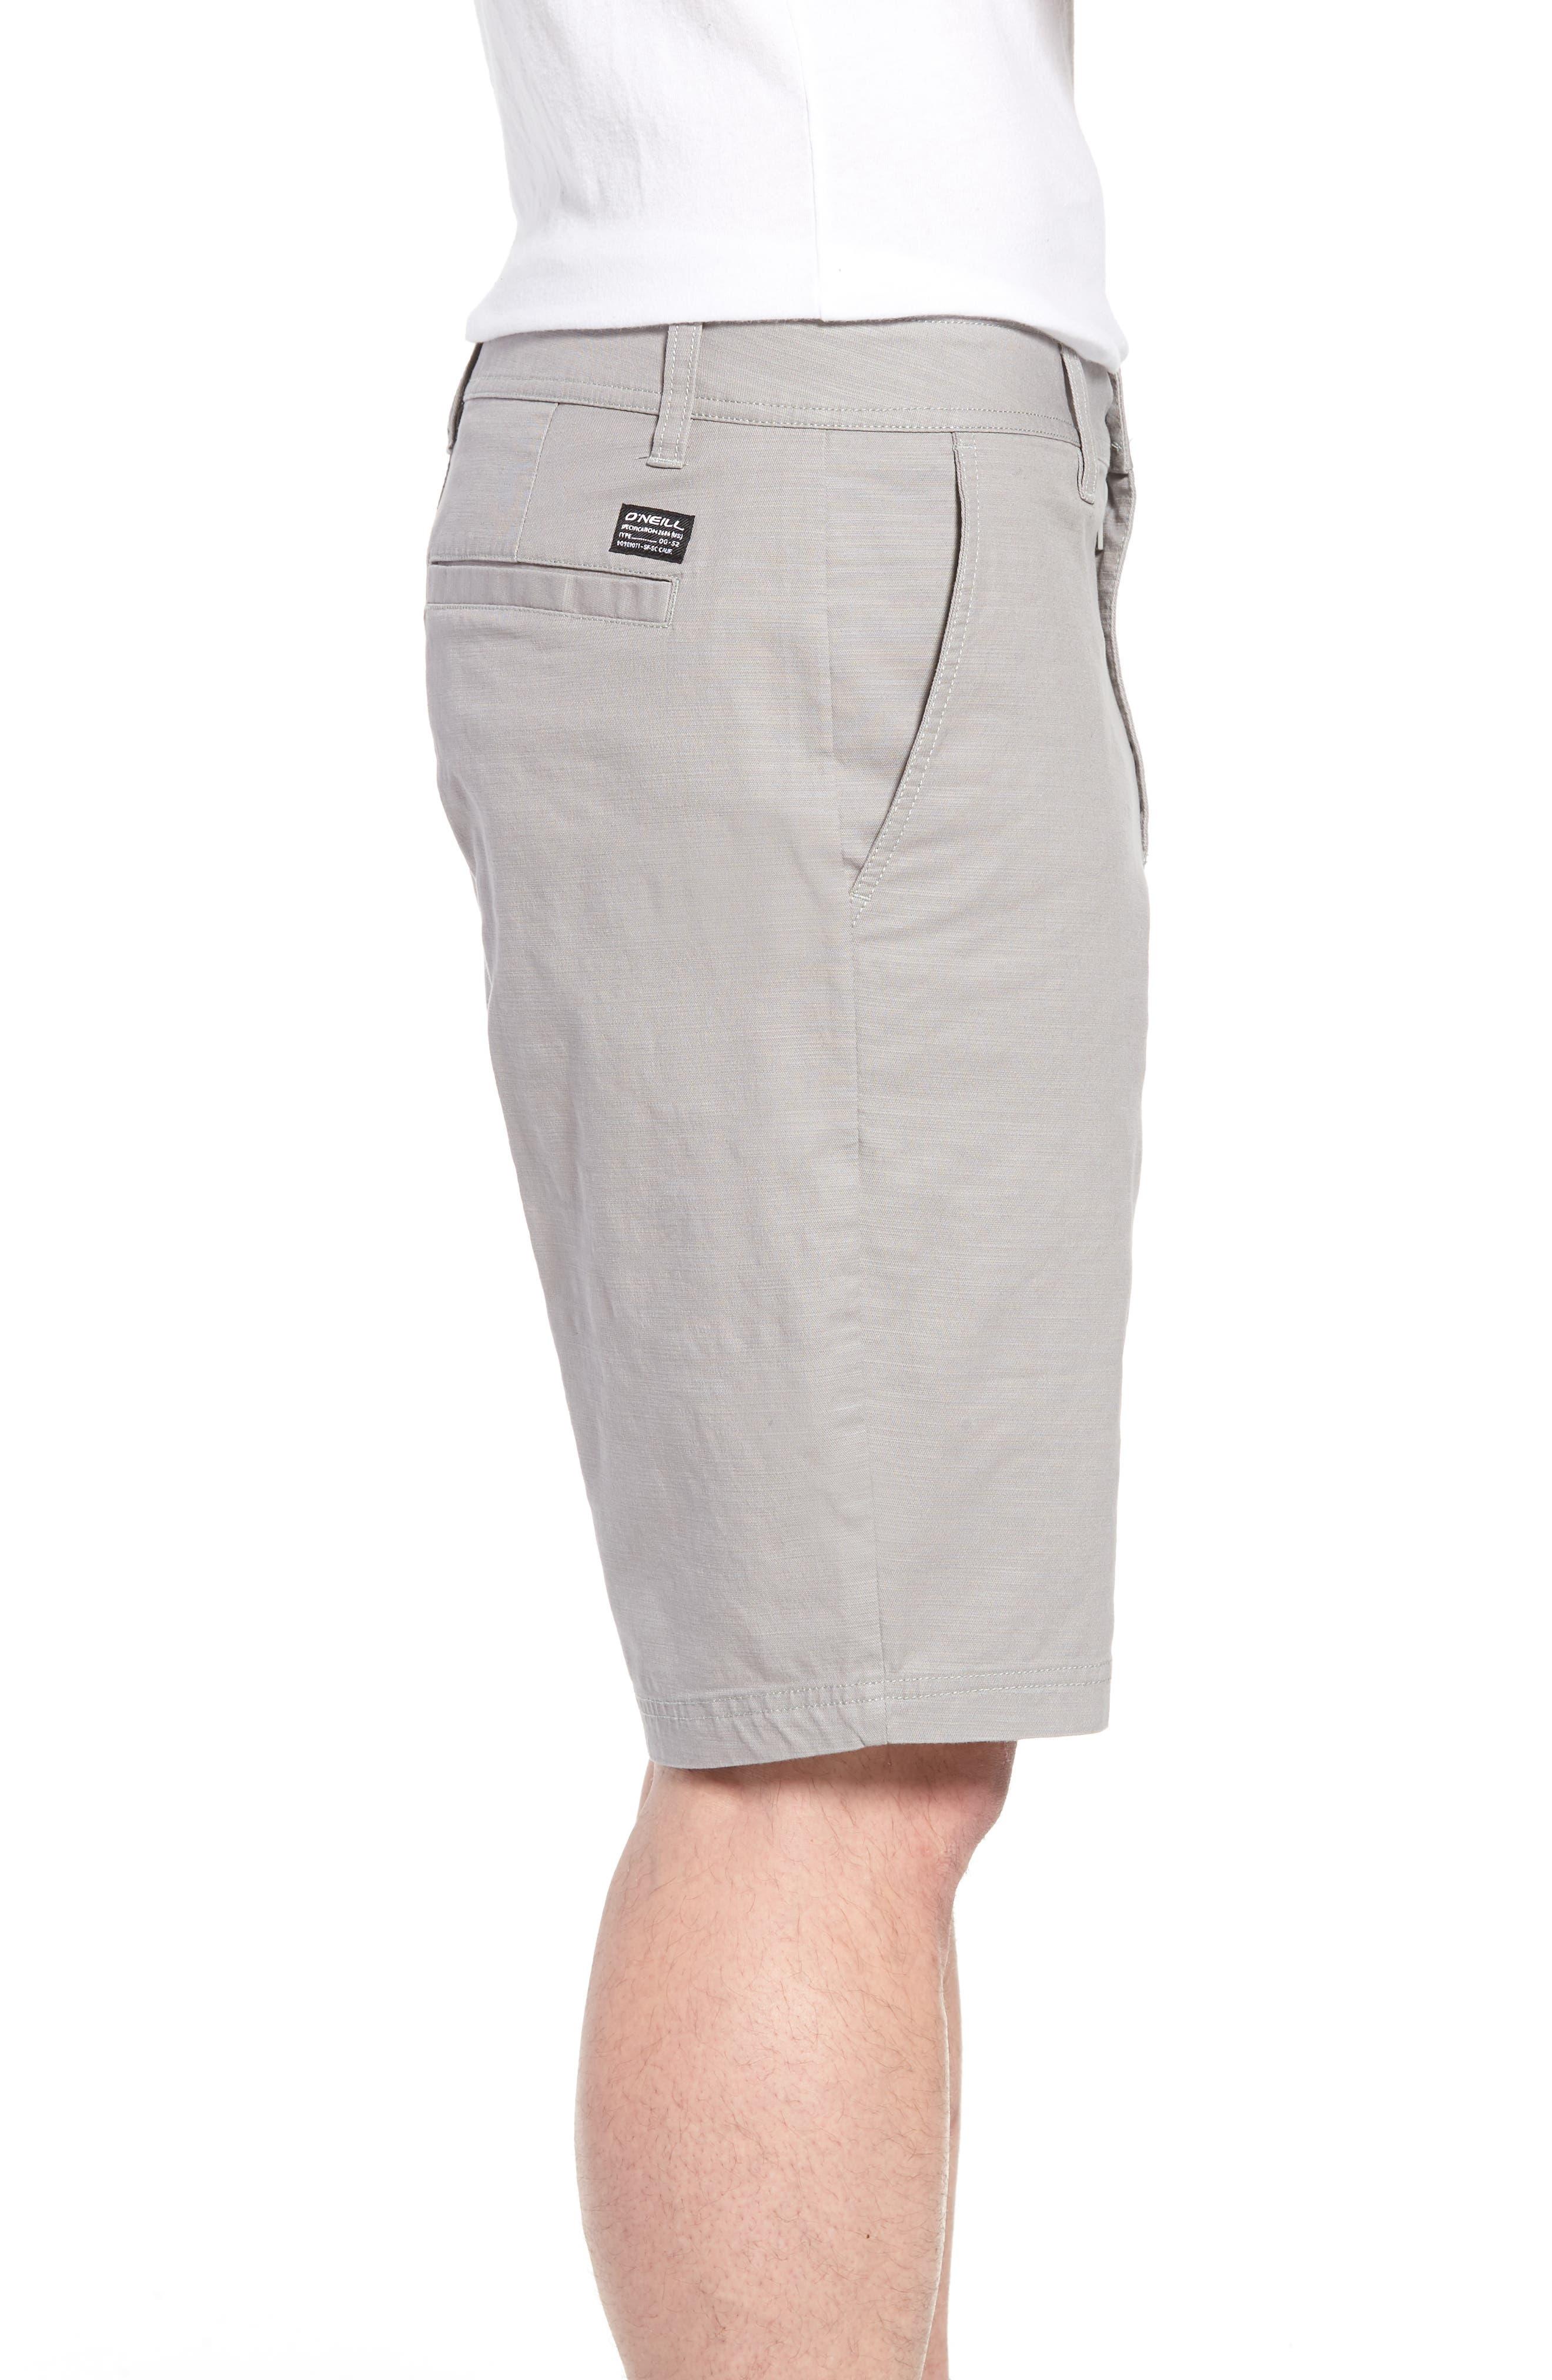 Jay Stretch Chino Shorts,                             Alternate thumbnail 3, color,                             Light Grey